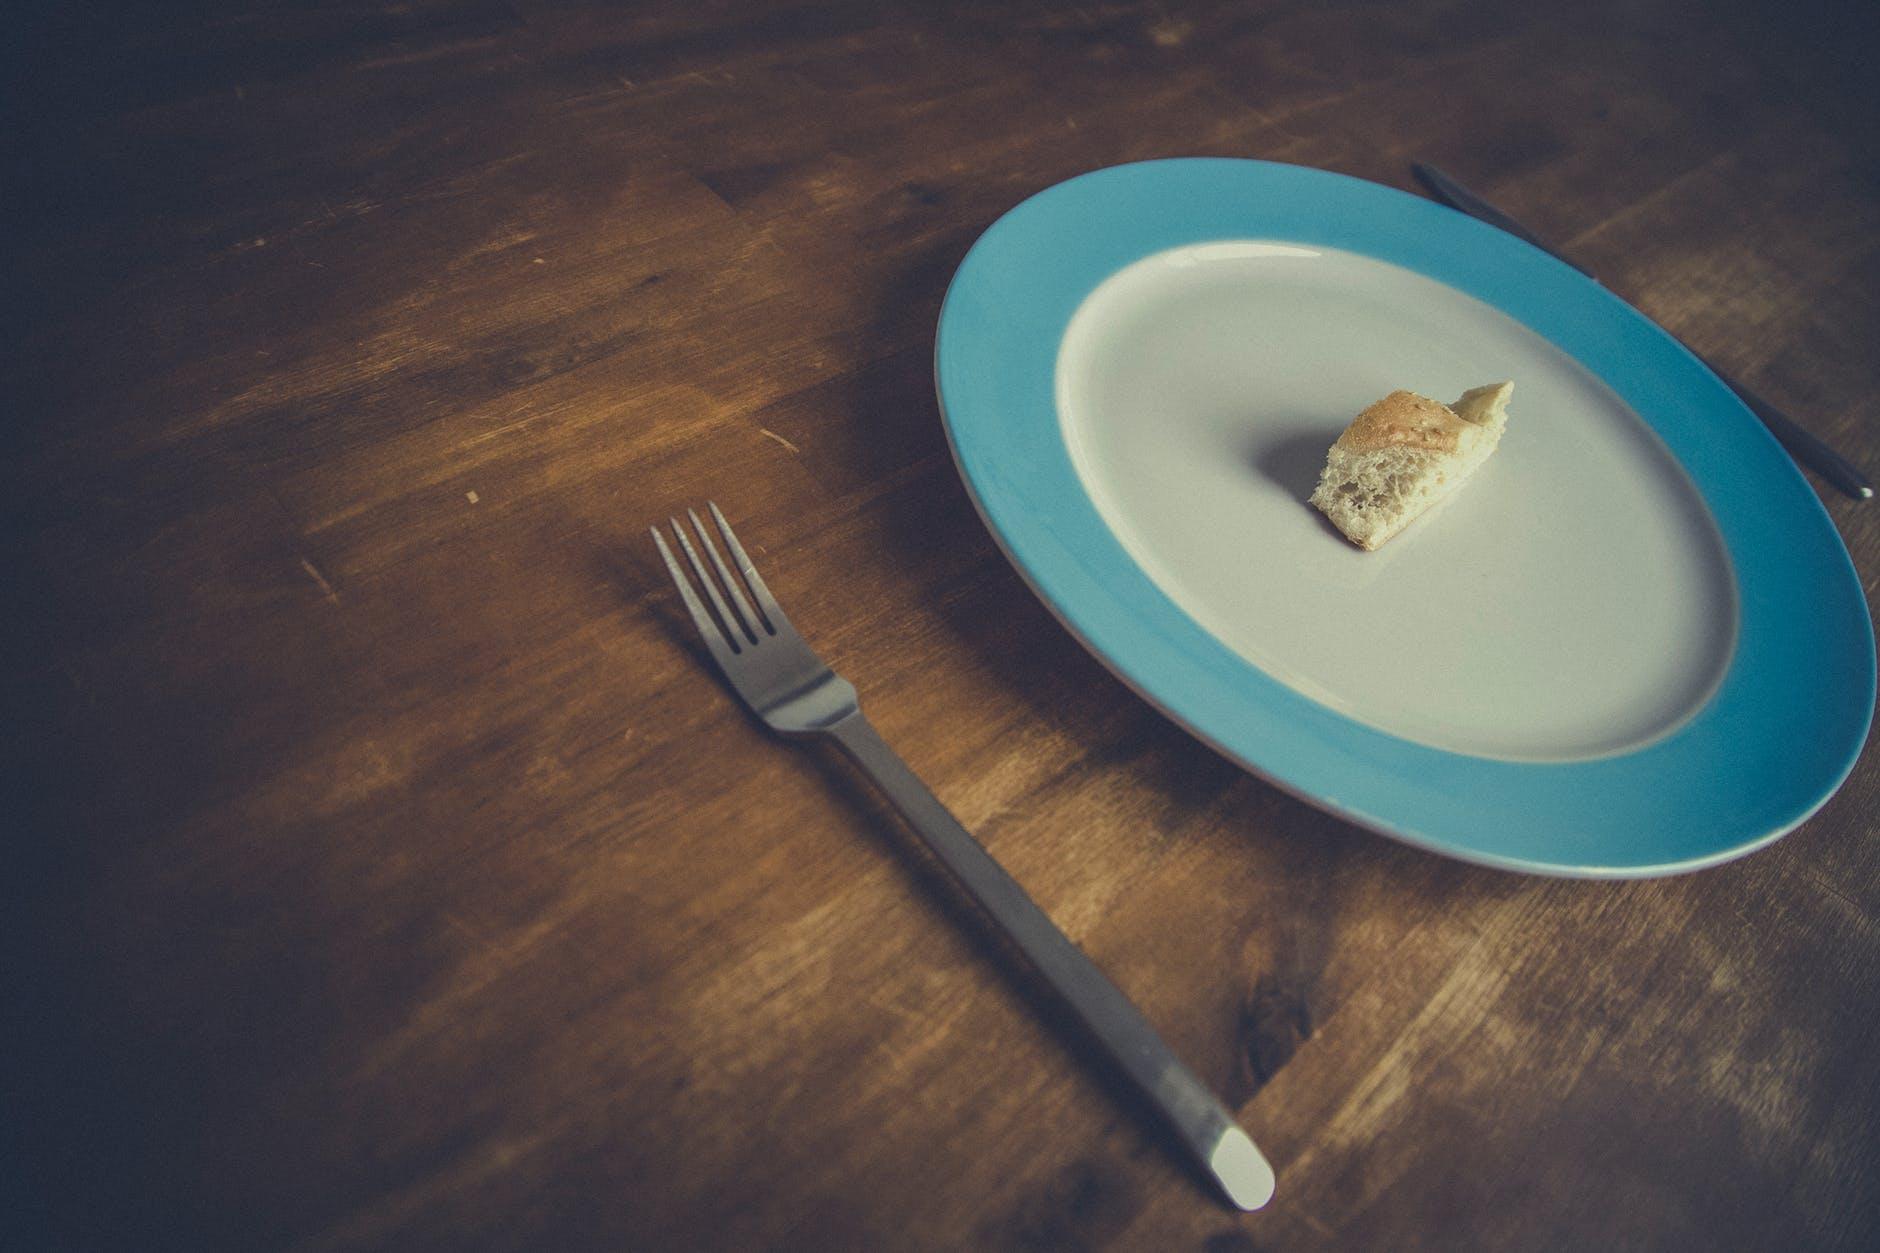 Ukuran Piring Makan, Menentukan Jumlah Kalori????